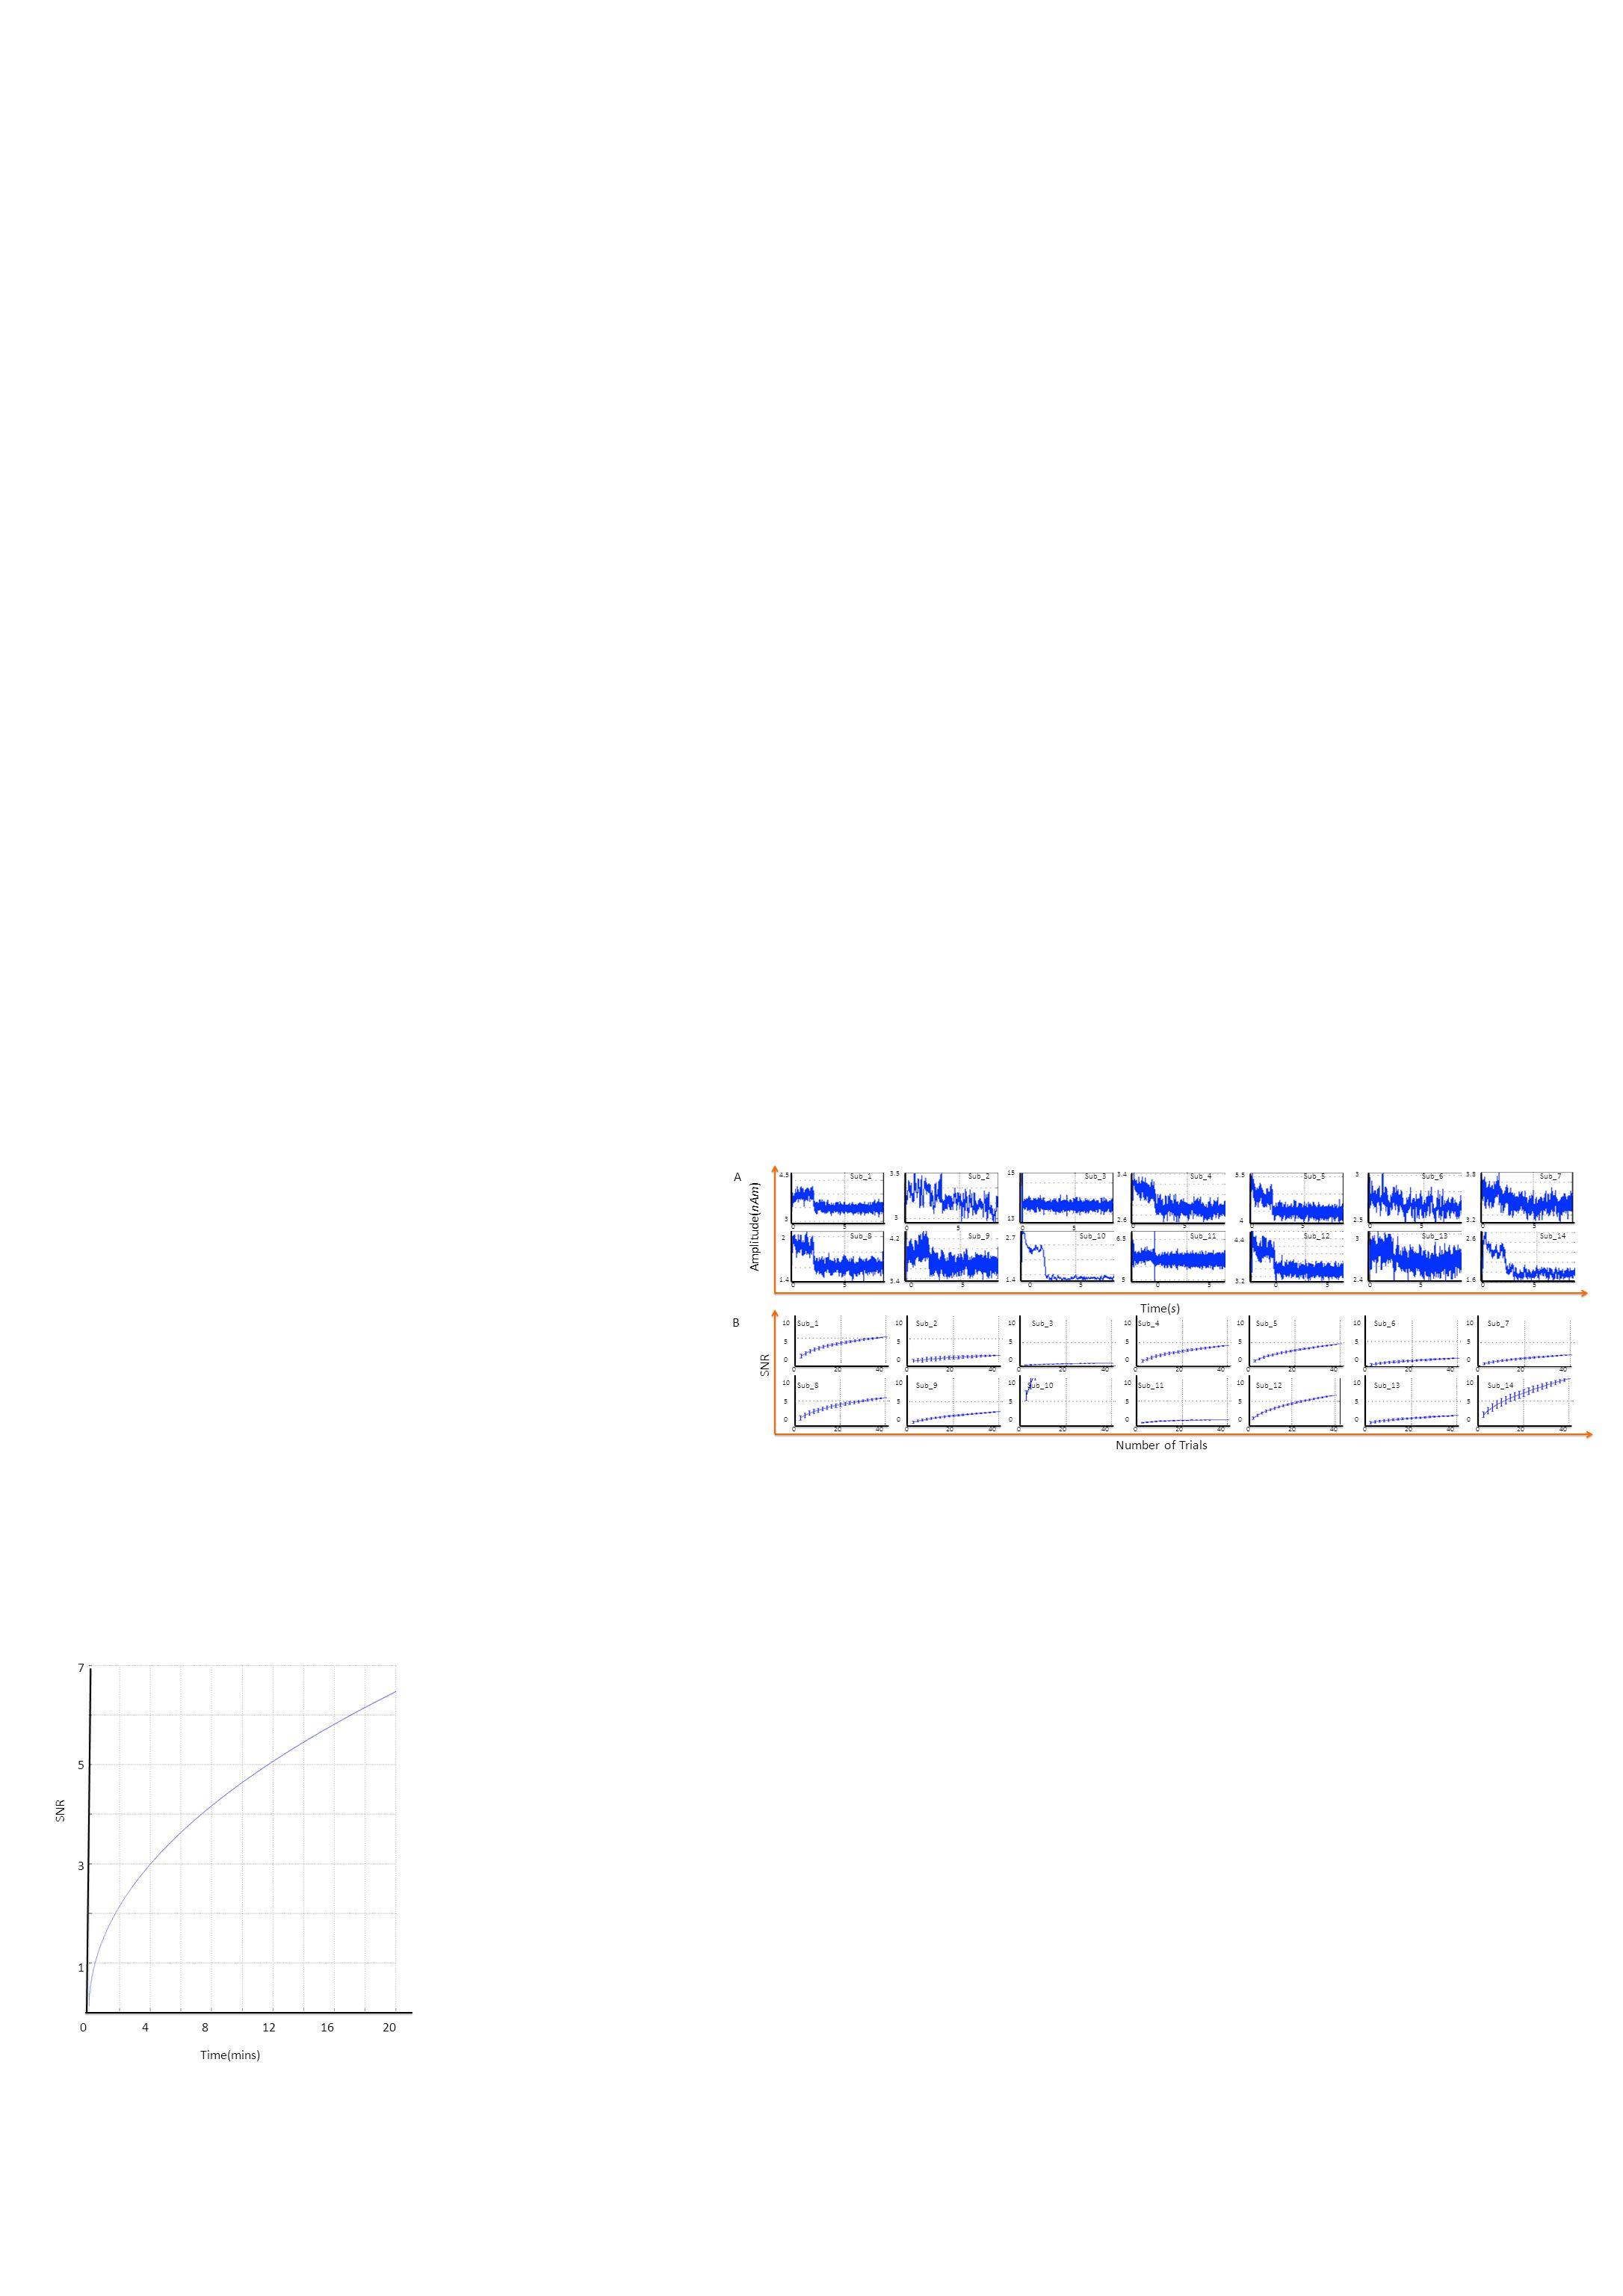 05 0505 05050505 05050505050505 4.5 3 3.5 3 15 13 3.4 2.6 5.5 4 3 2.5 3.8 3.2 2 1.4 4.2 3.4 2.7 1.4 6.5 5 4.4 3.2 3 2.4 2.6 1.6 Time(s) Amplitude(nAm) Number of Trials A Sub_1Sub_2Sub_3Sub_4Sub_5Sub_6Sub_7 Sub_8Sub_9Sub_10Sub_11Sub_12Sub_13Sub_14 02040 10 0 5 02040 10 0 5 02040 10 0 5 02040 10 0 5 02040 10 0 5 02040 10 0 5 02040 10 0 5 02040 10 0 5 02040 10 0 5 02040 10 0 5 02040 10 0 5 02040 10 0 5 02040 10 0 5 02040 10 0 5 Sub_1Sub_2Sub_3Sub_4Sub_5Sub_6Sub_7 Sub_8Sub_9Sub_10Sub_11Sub_12Sub_13Sub_14 SNR B 7 5 3 1 048121620 Time(mins) SNR